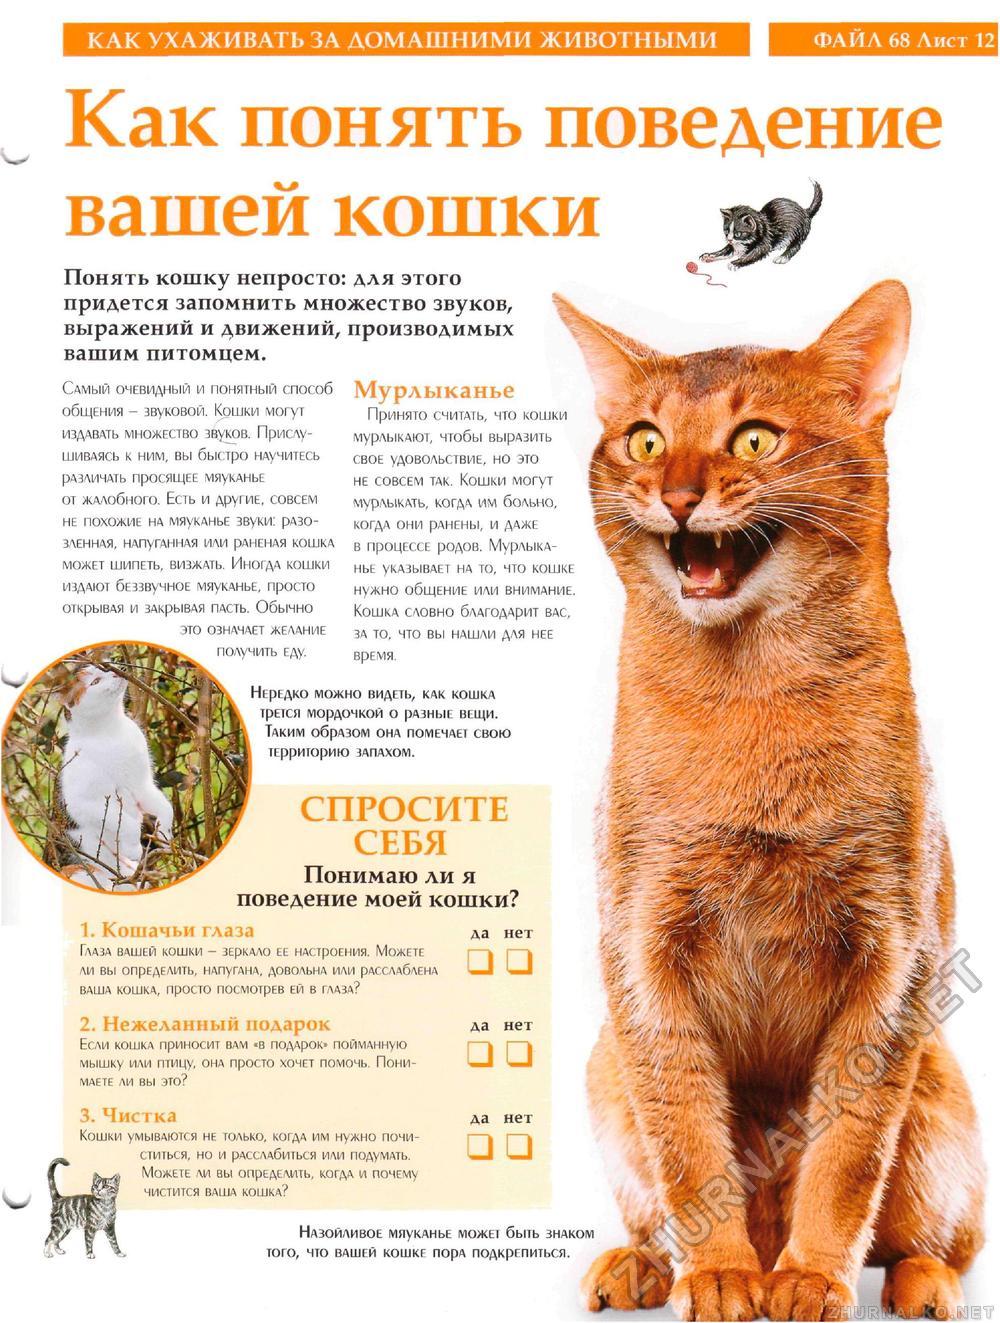 Поведение кошки картинки